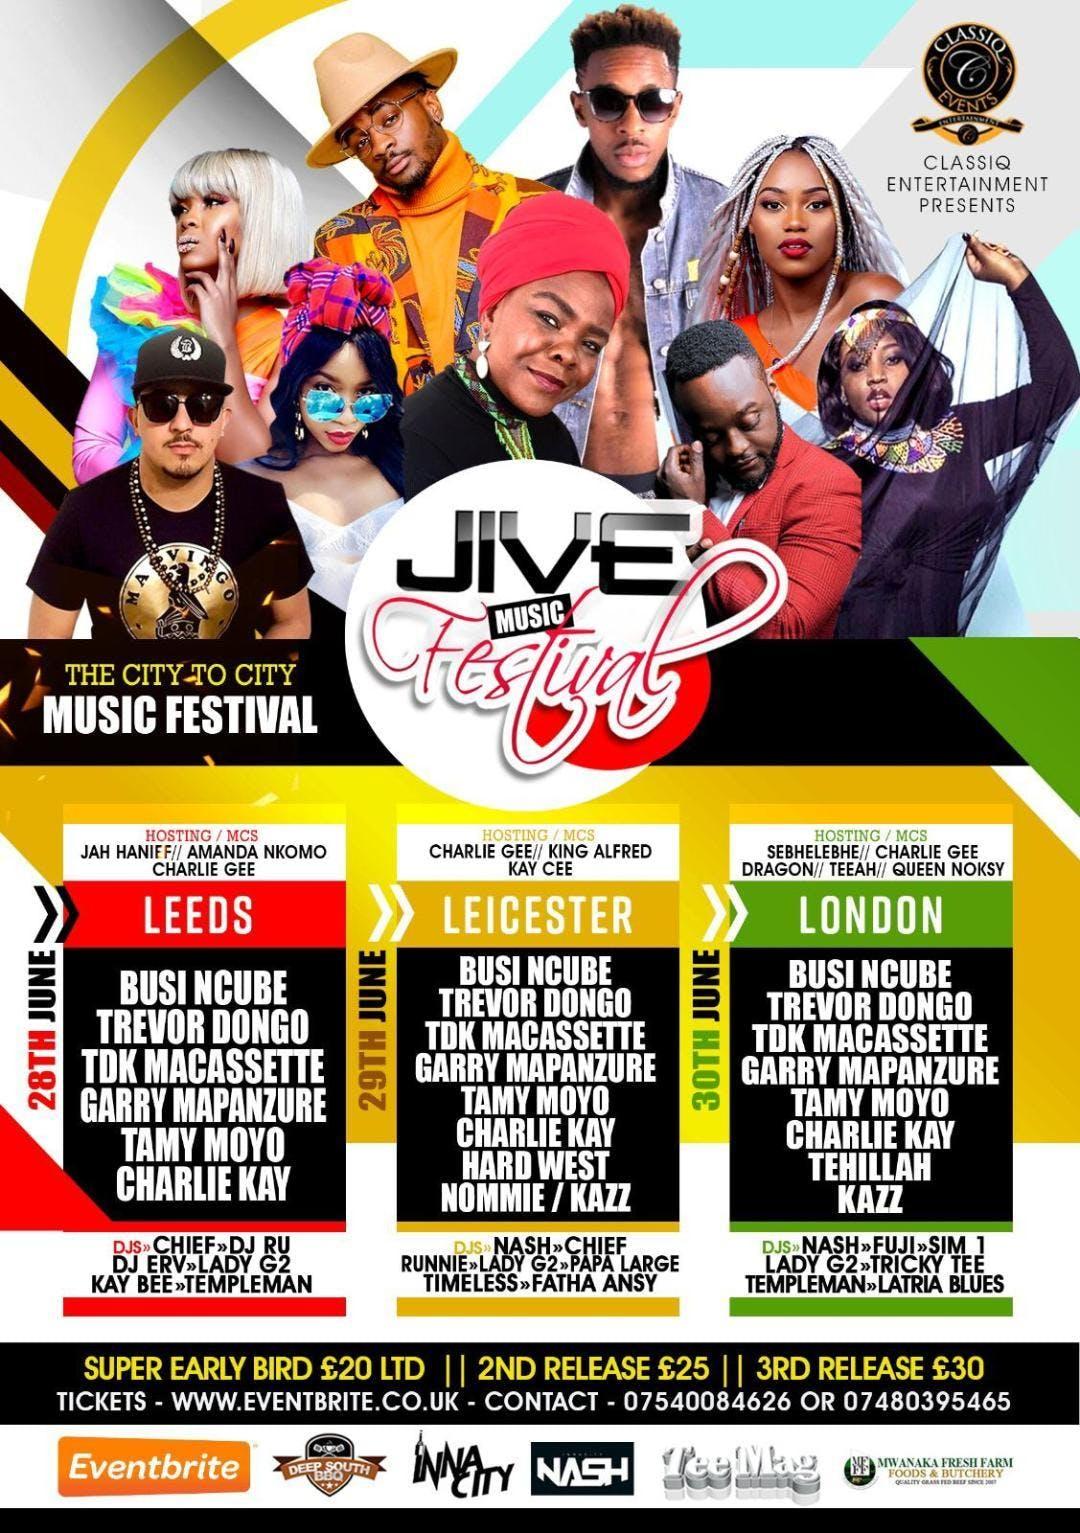 JIVE MUSIC FESTIVAL 2019 || LONDON SHOW